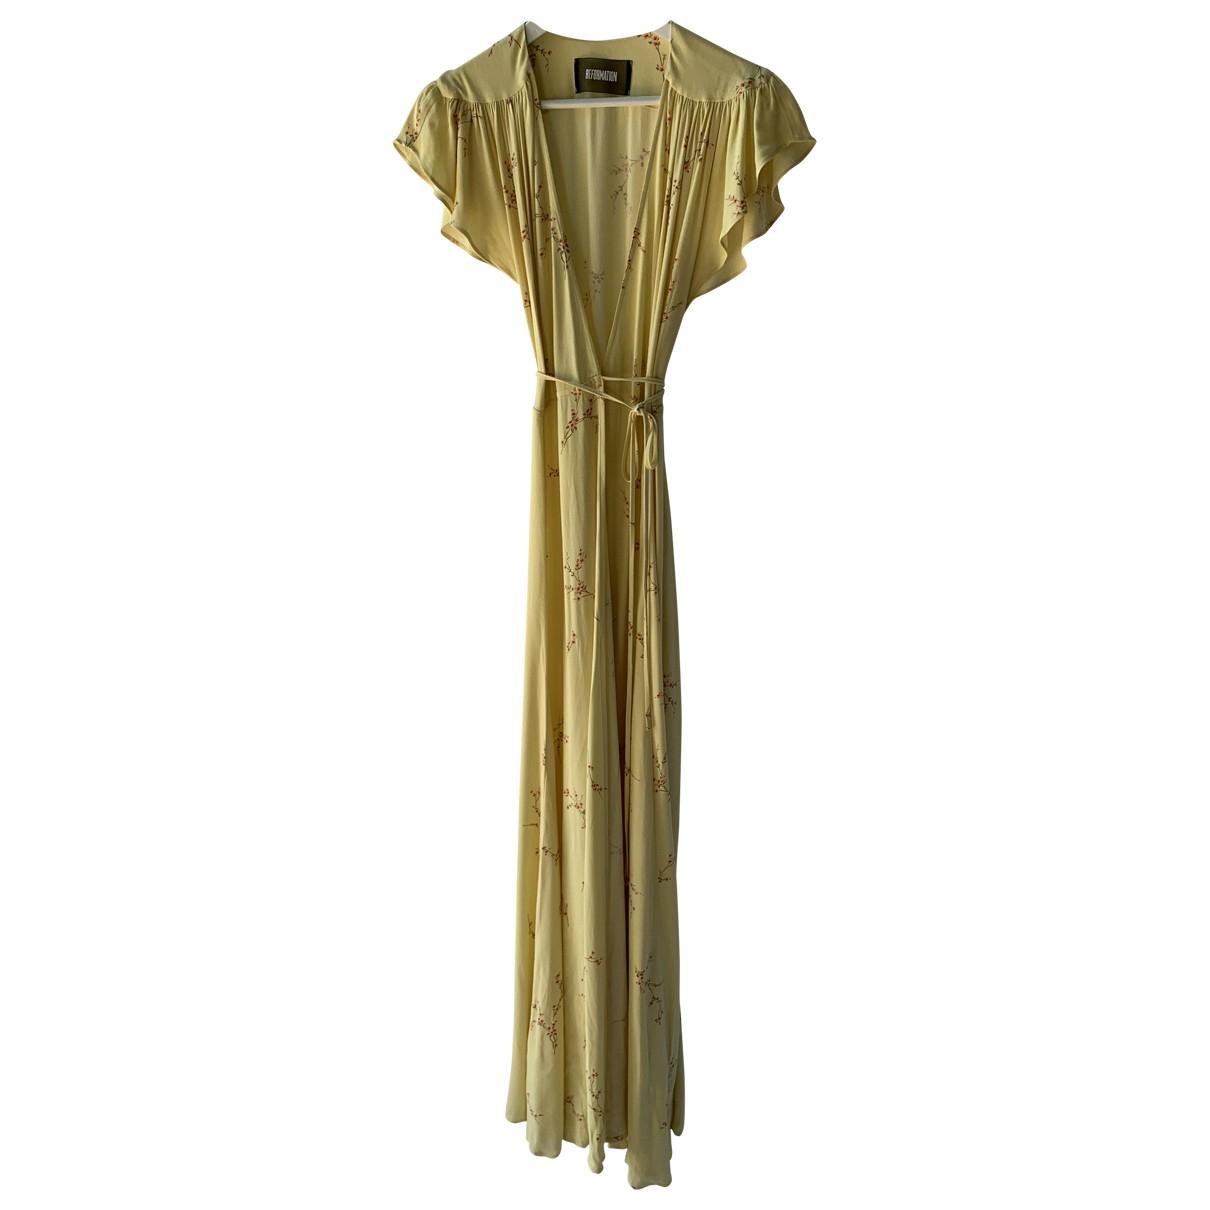 Reformation \N Yellow dress for Women XS International